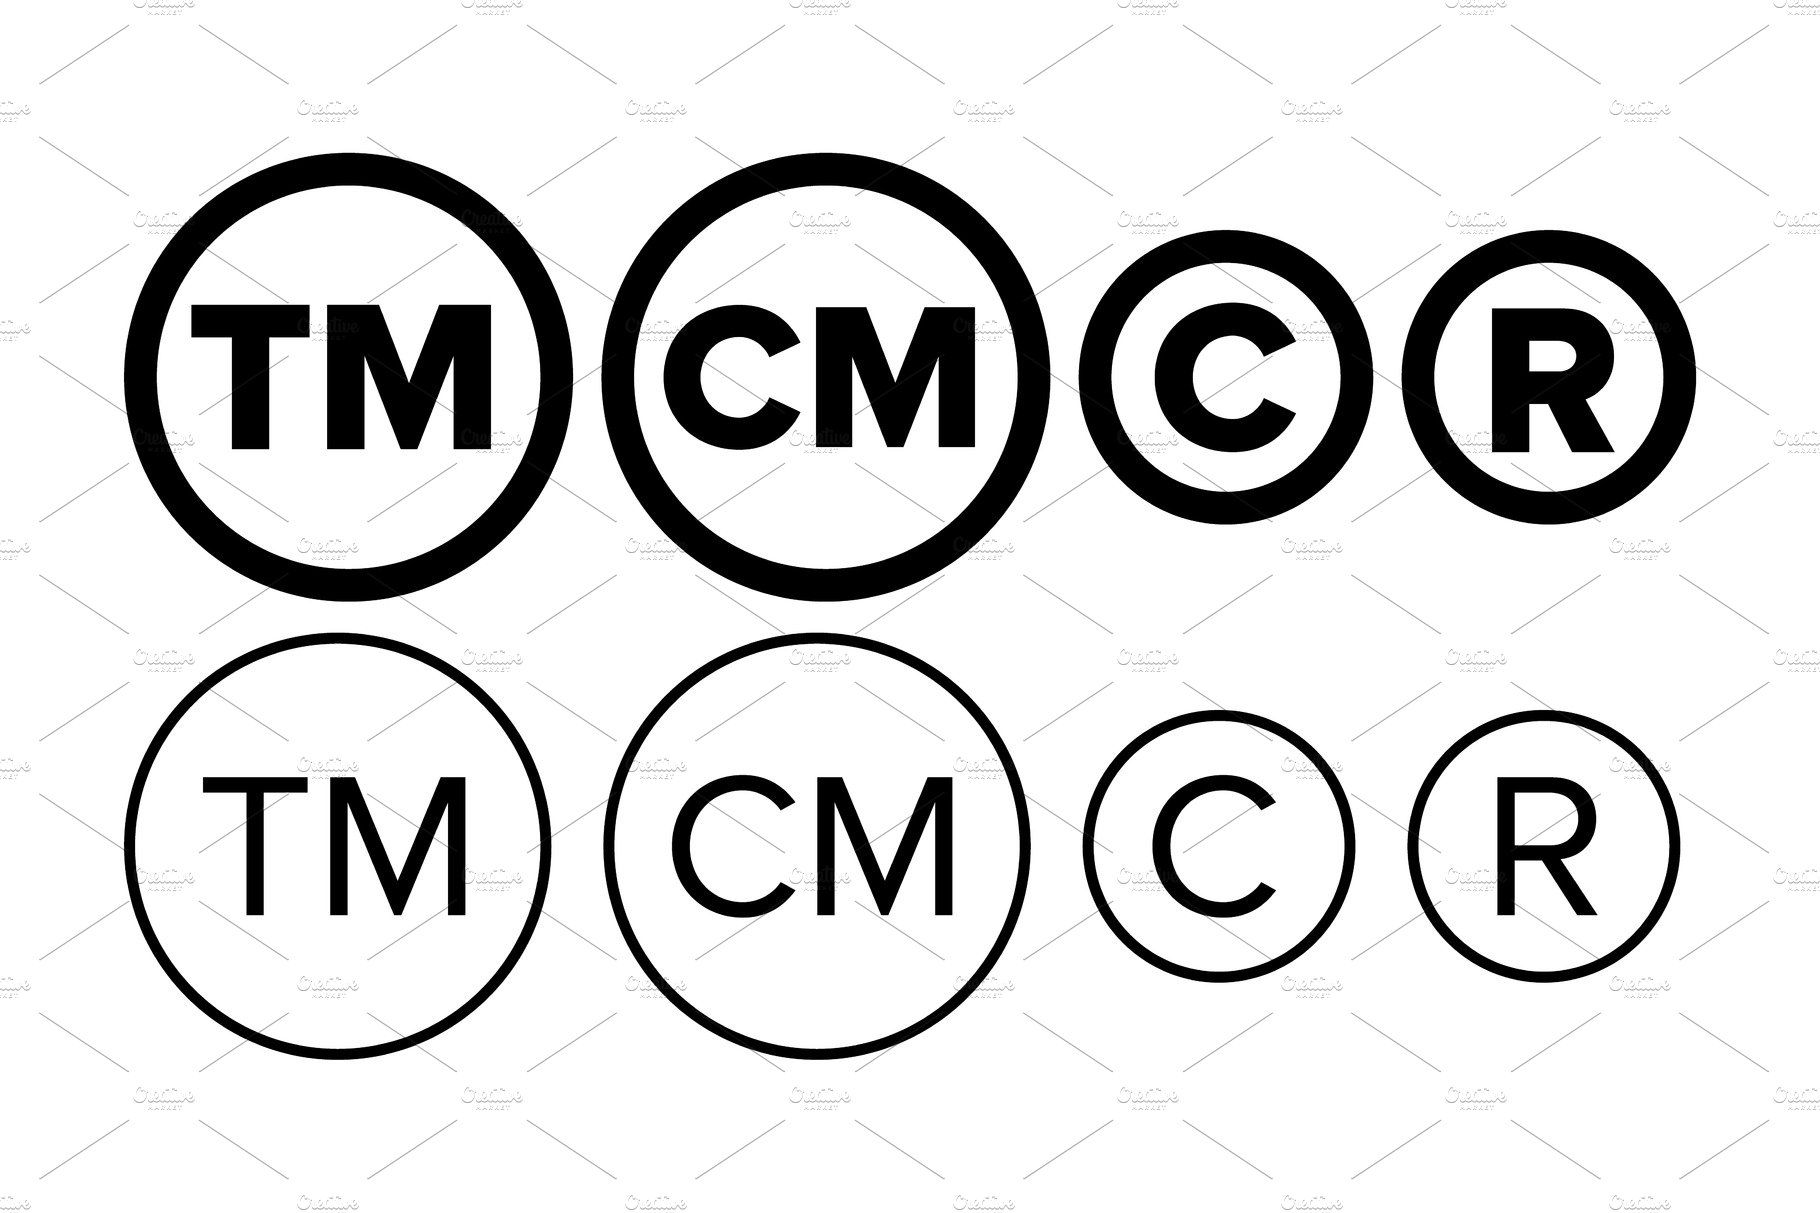 Copyright And Registered Trademark Trademark, Registered